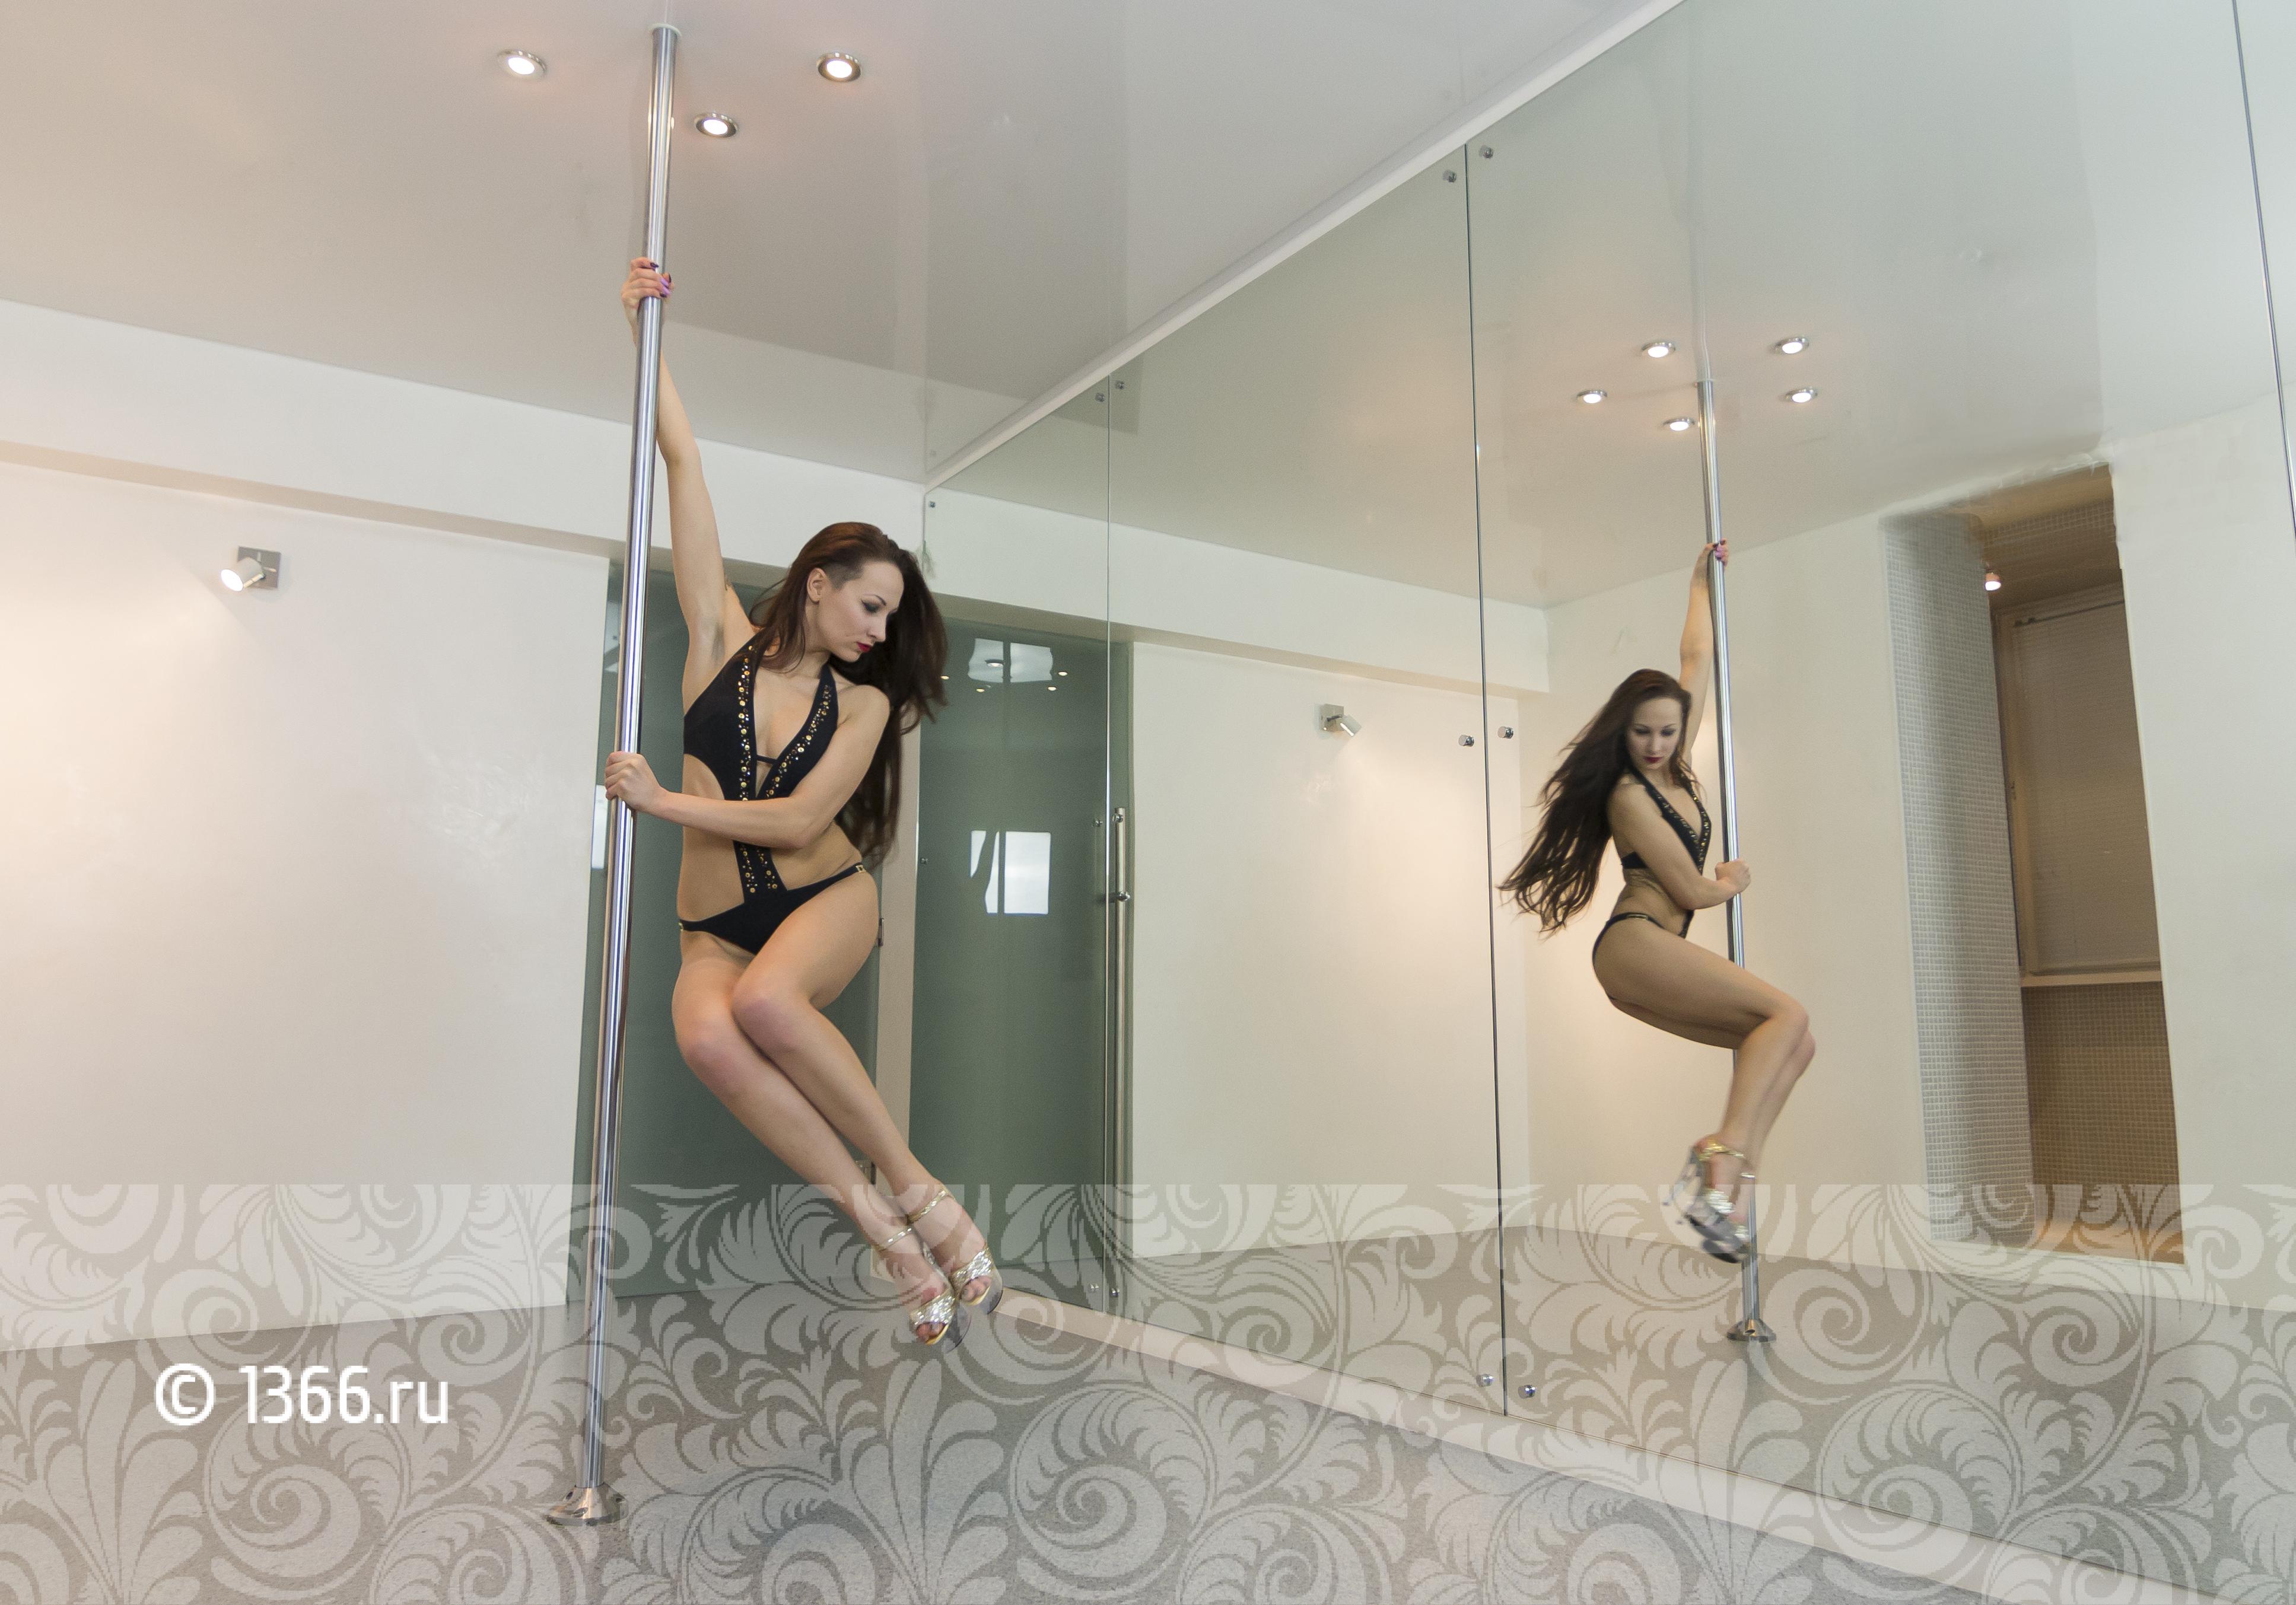 pole dance Москва, pole dance школа